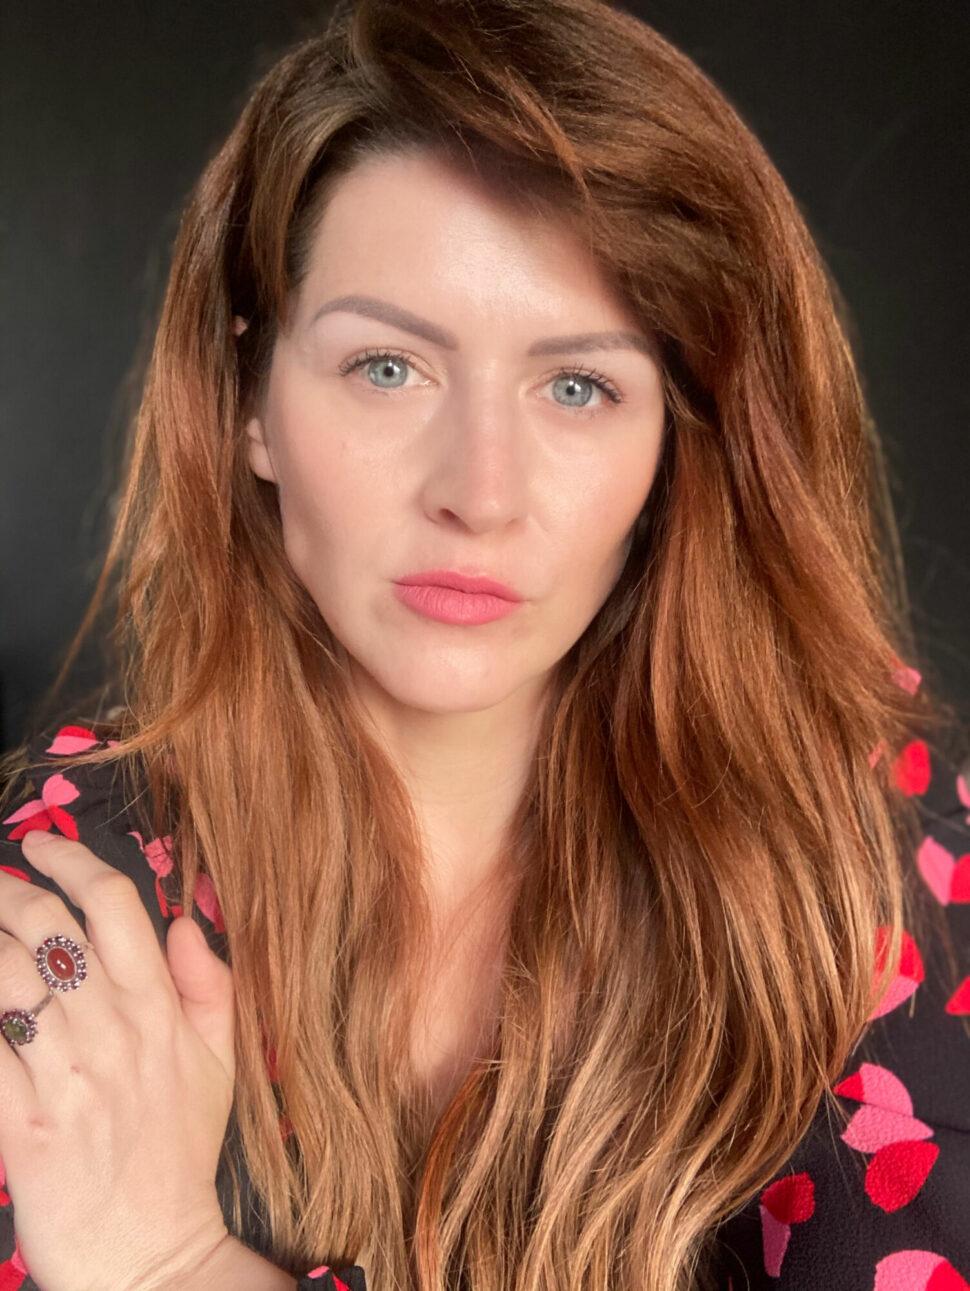 Das Porträt Mirke Bittner